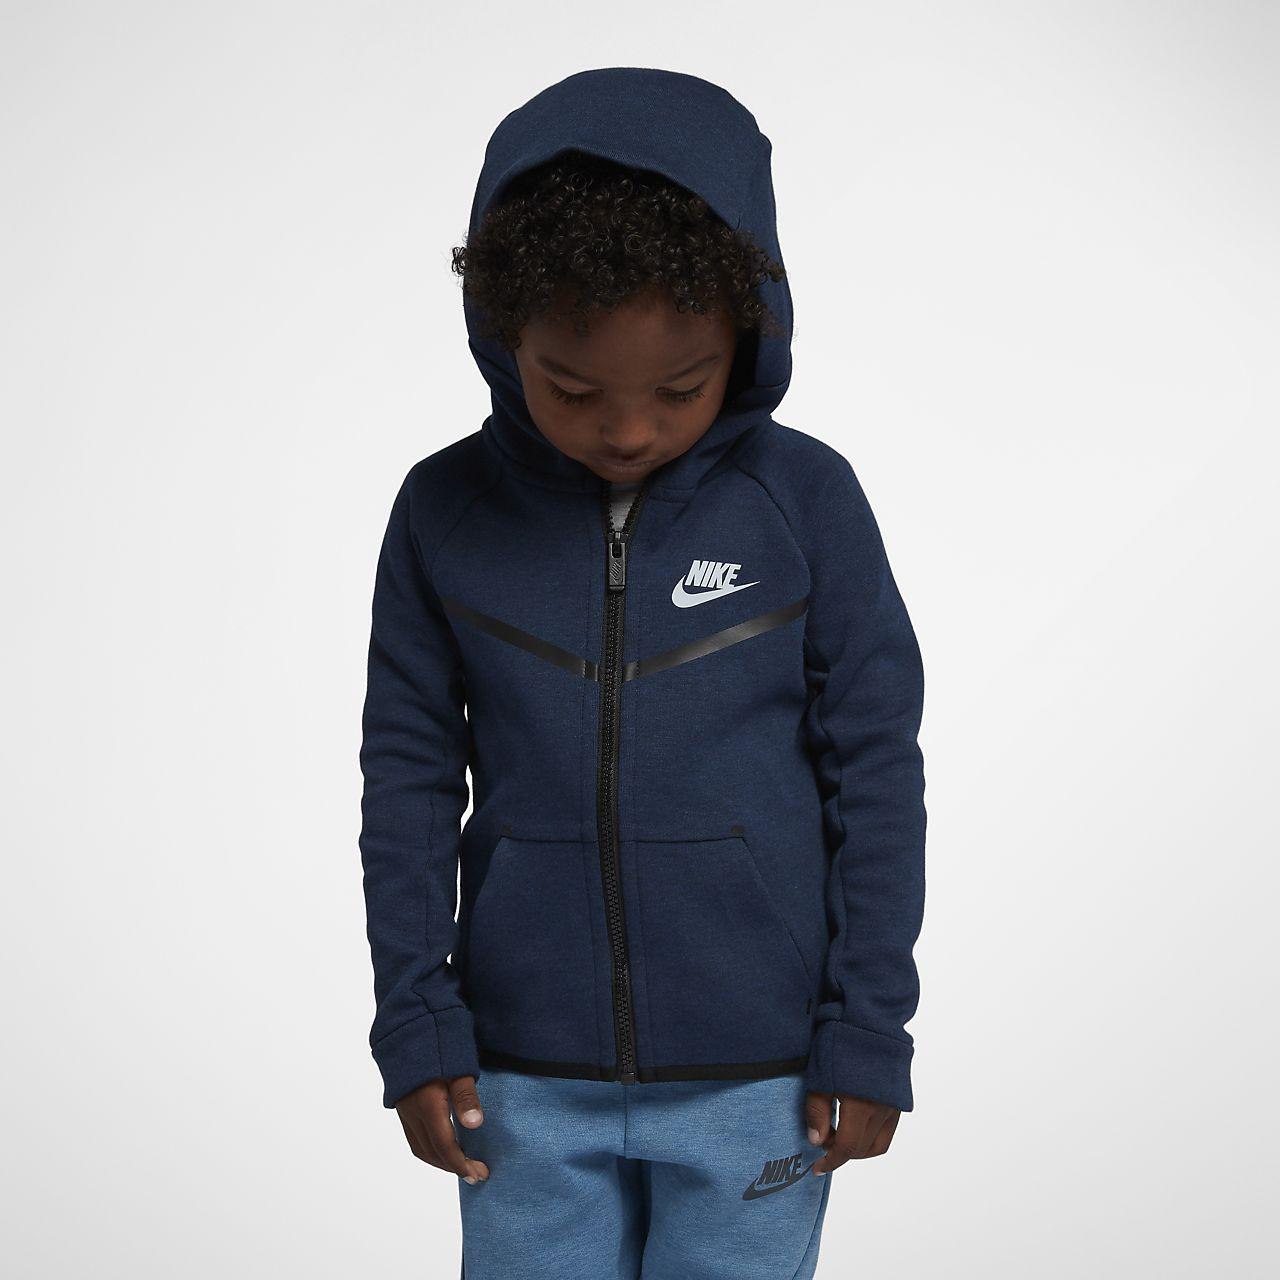 Nike Sportswear Tech Fleece Sudadera con capucha - Niño pequeño